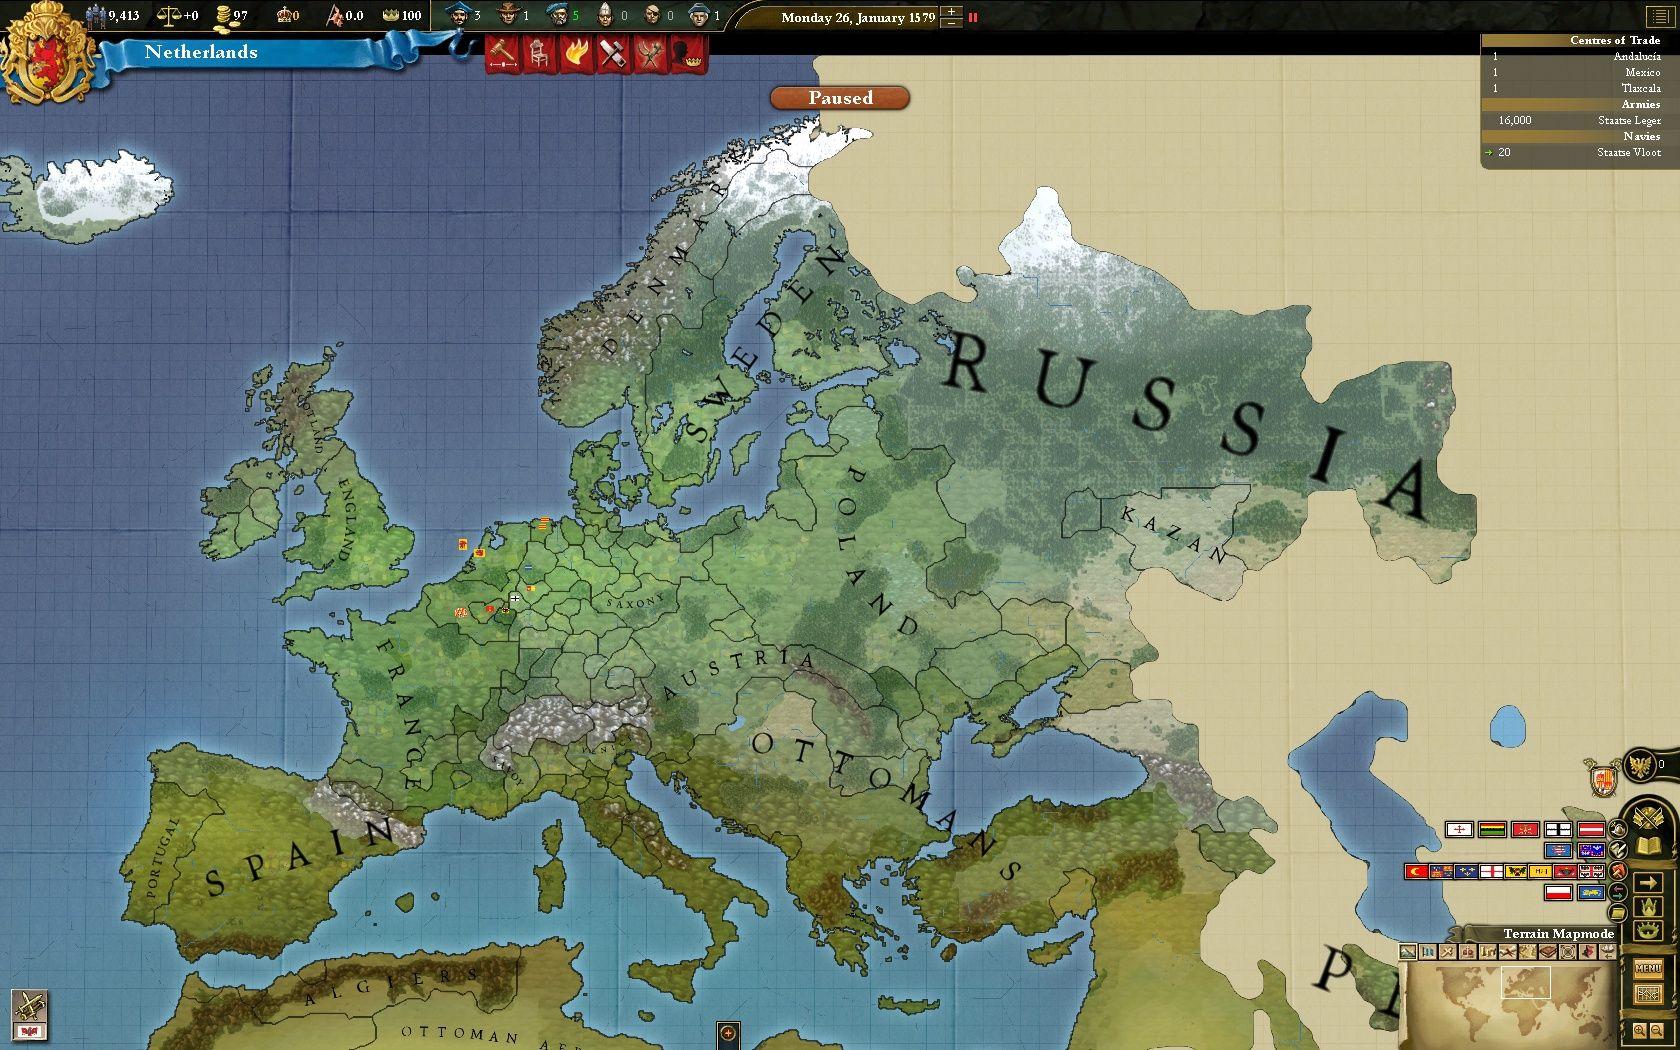 europa universalis 3 divine wind download free